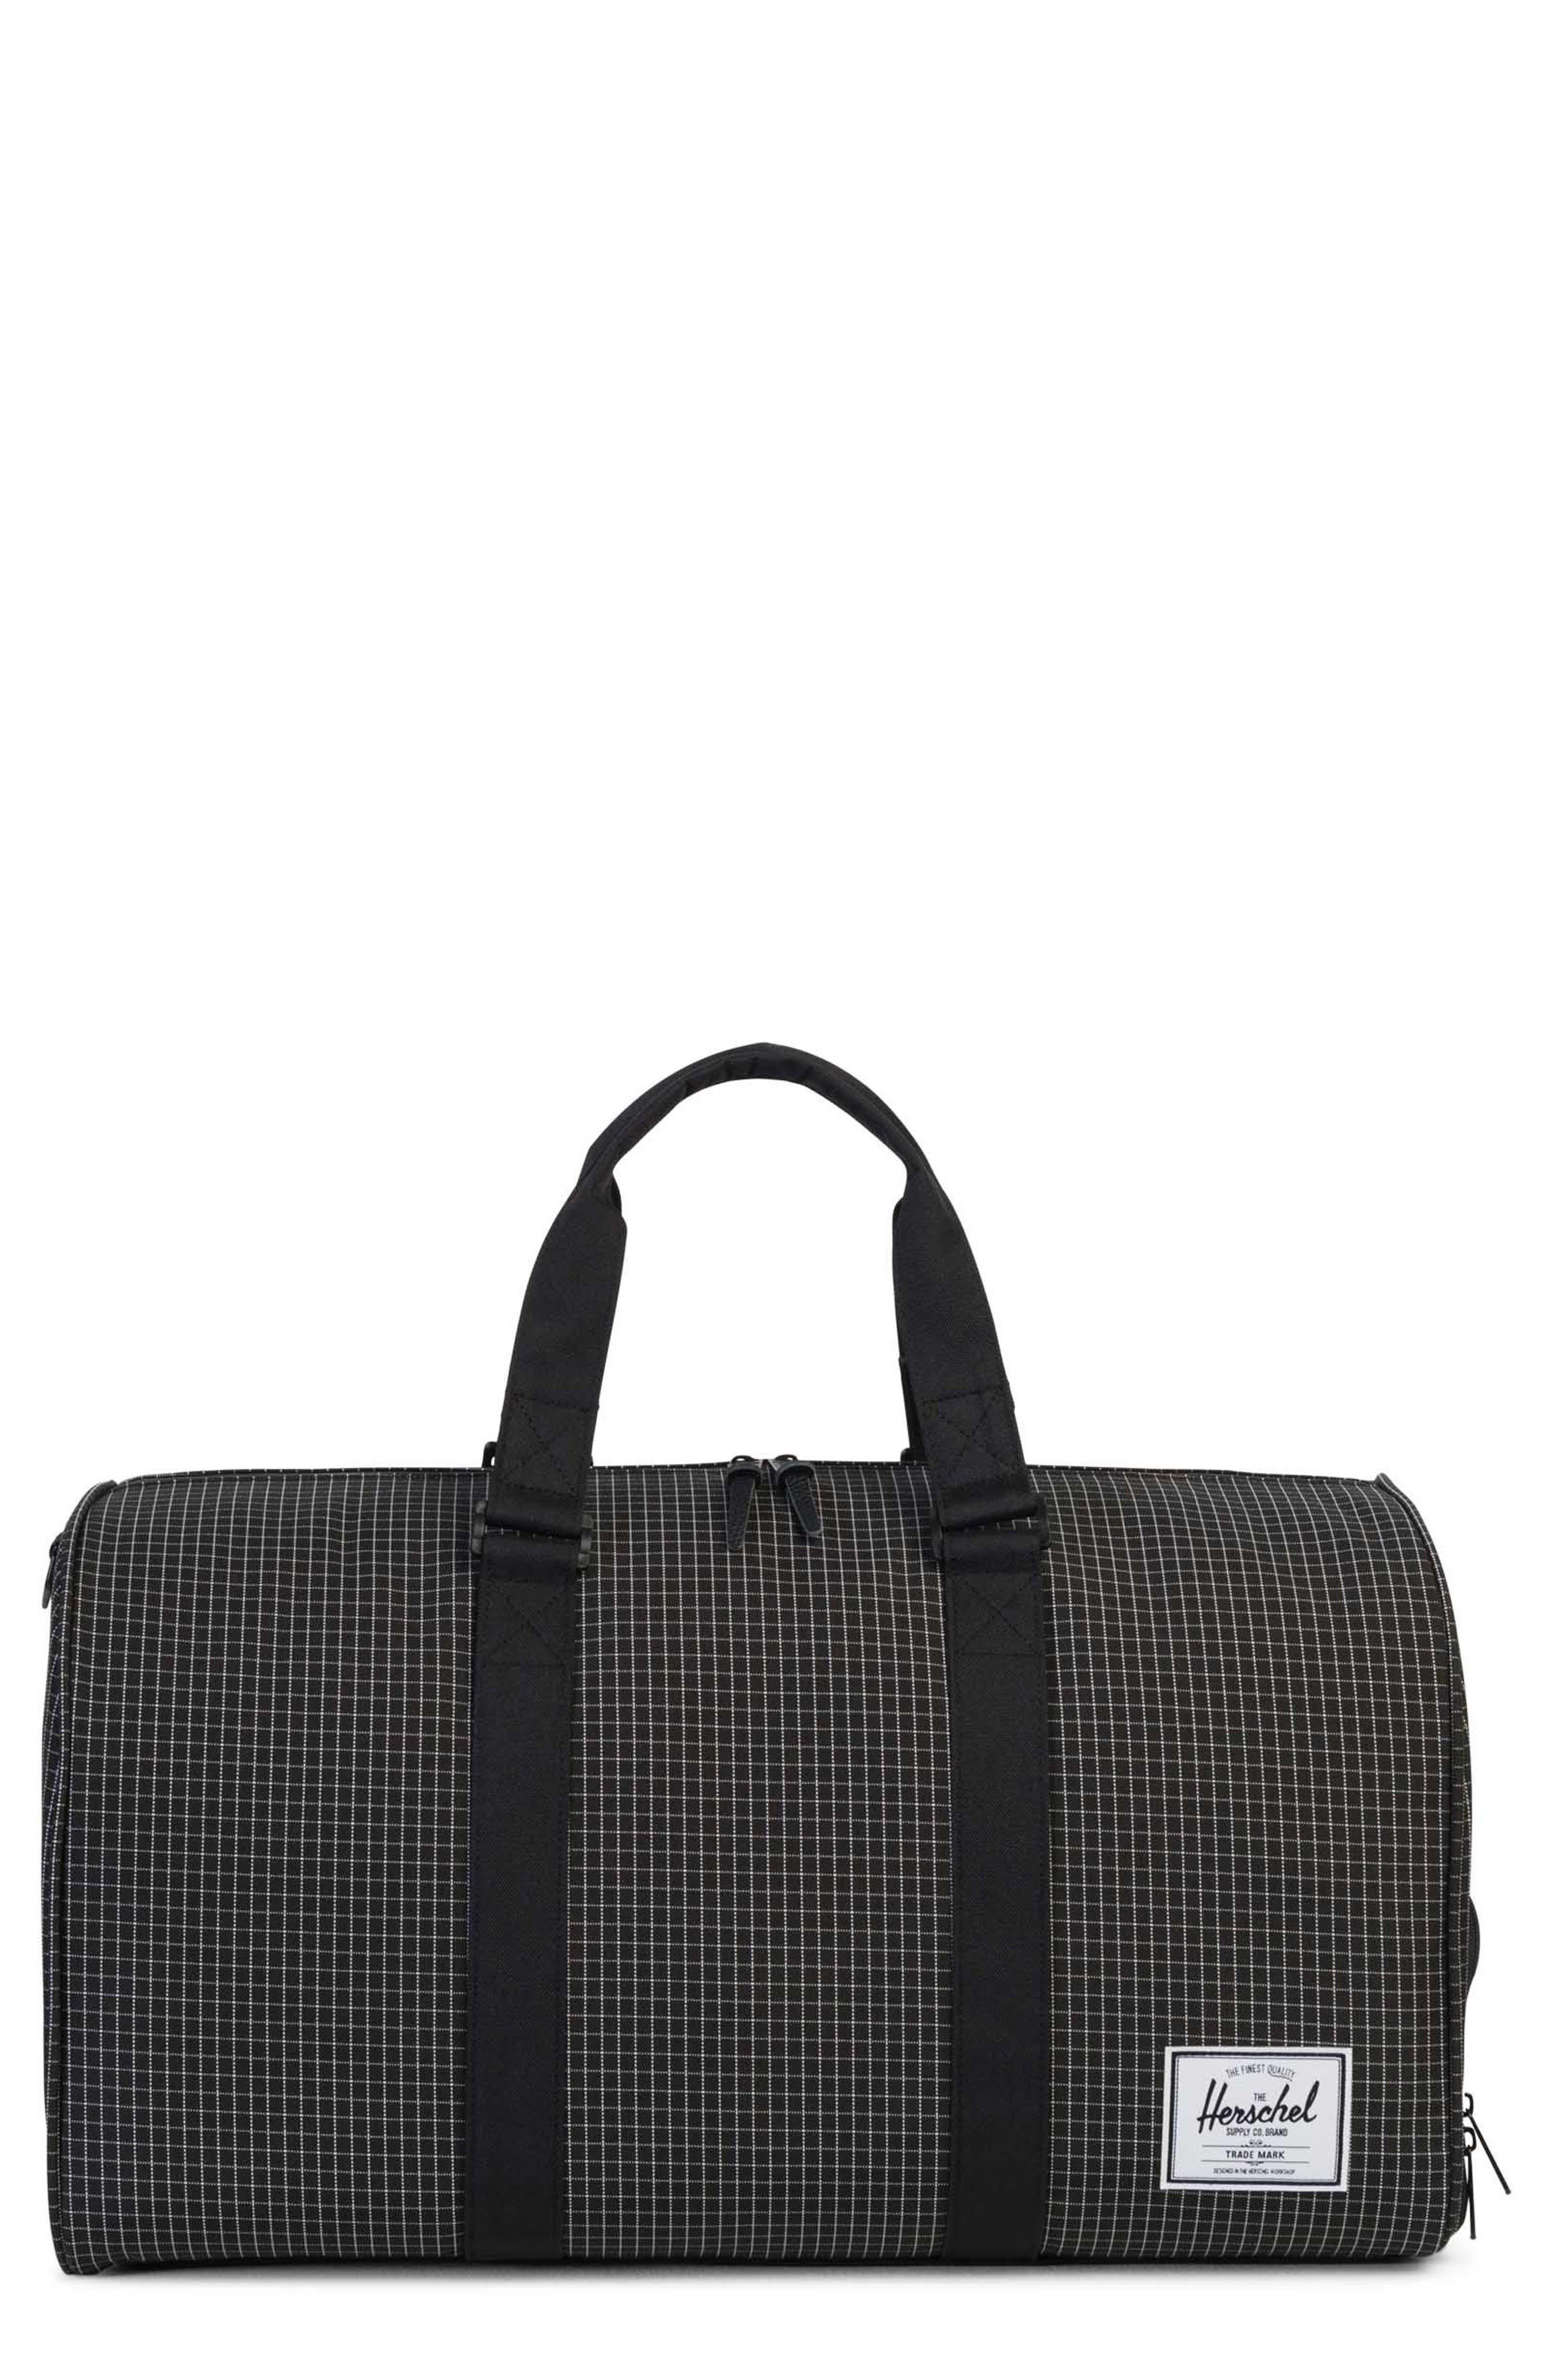 Alternate Image 1 Selected - Herschel Supply Co. Novel Duffel Bag